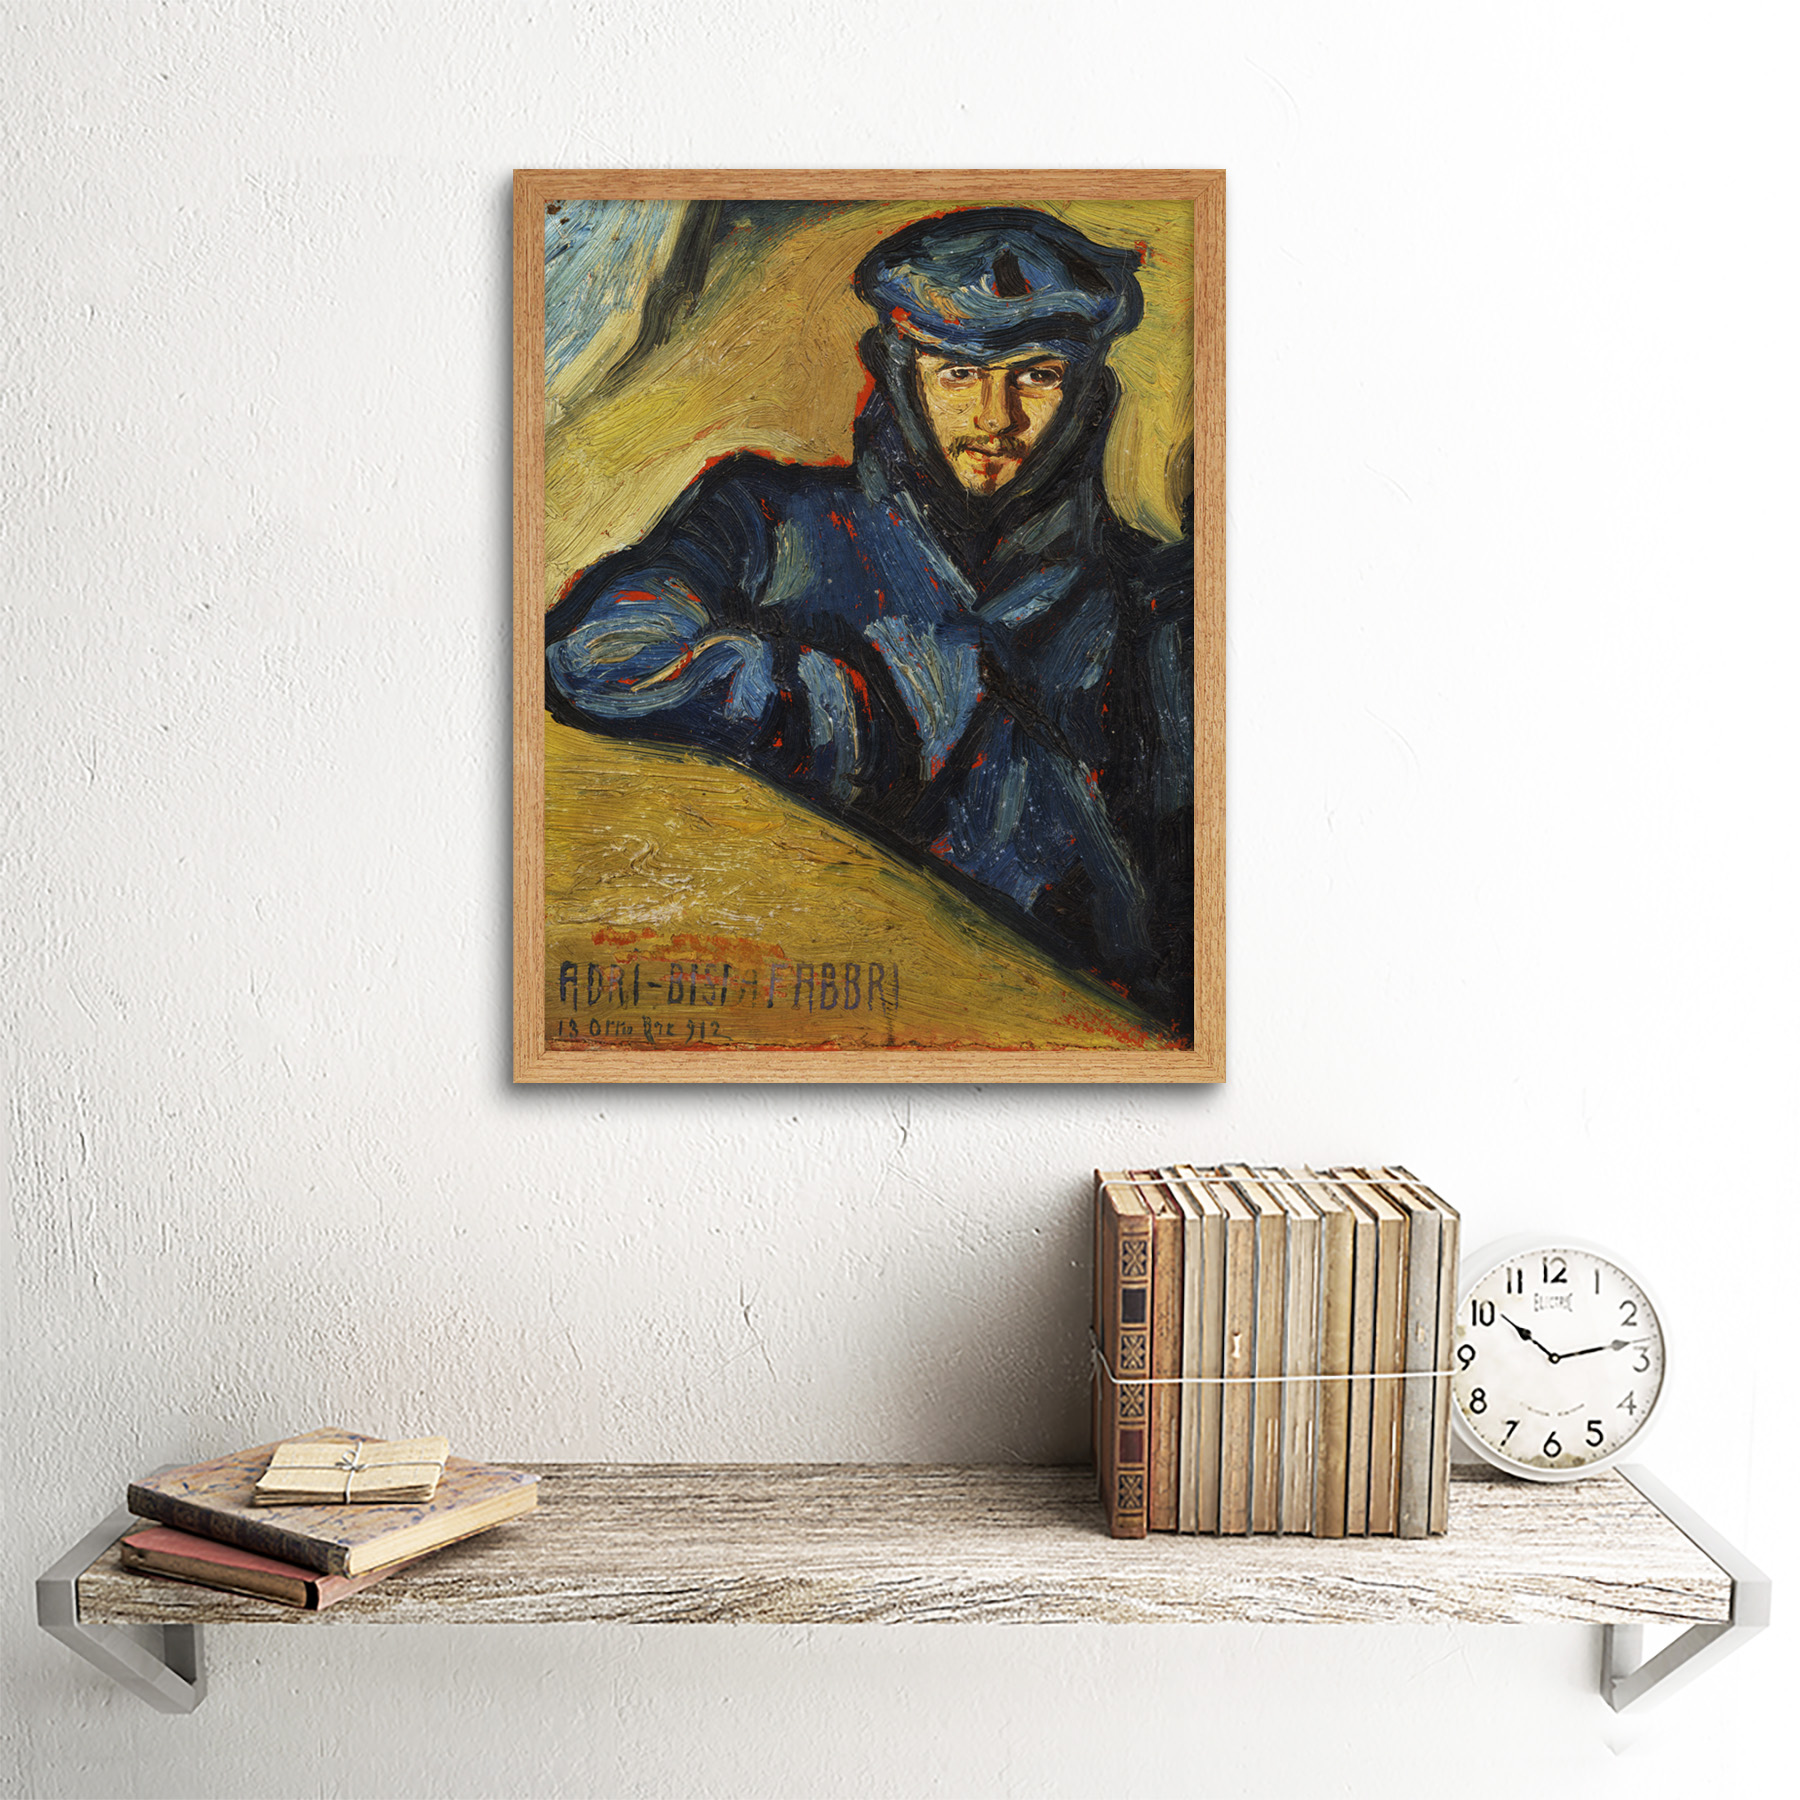 Bisi-Fabbri-Aviator-Pilot-Ricordo-Chavez-Painting-Framed-Wall-Art-Poster thumbnail 13